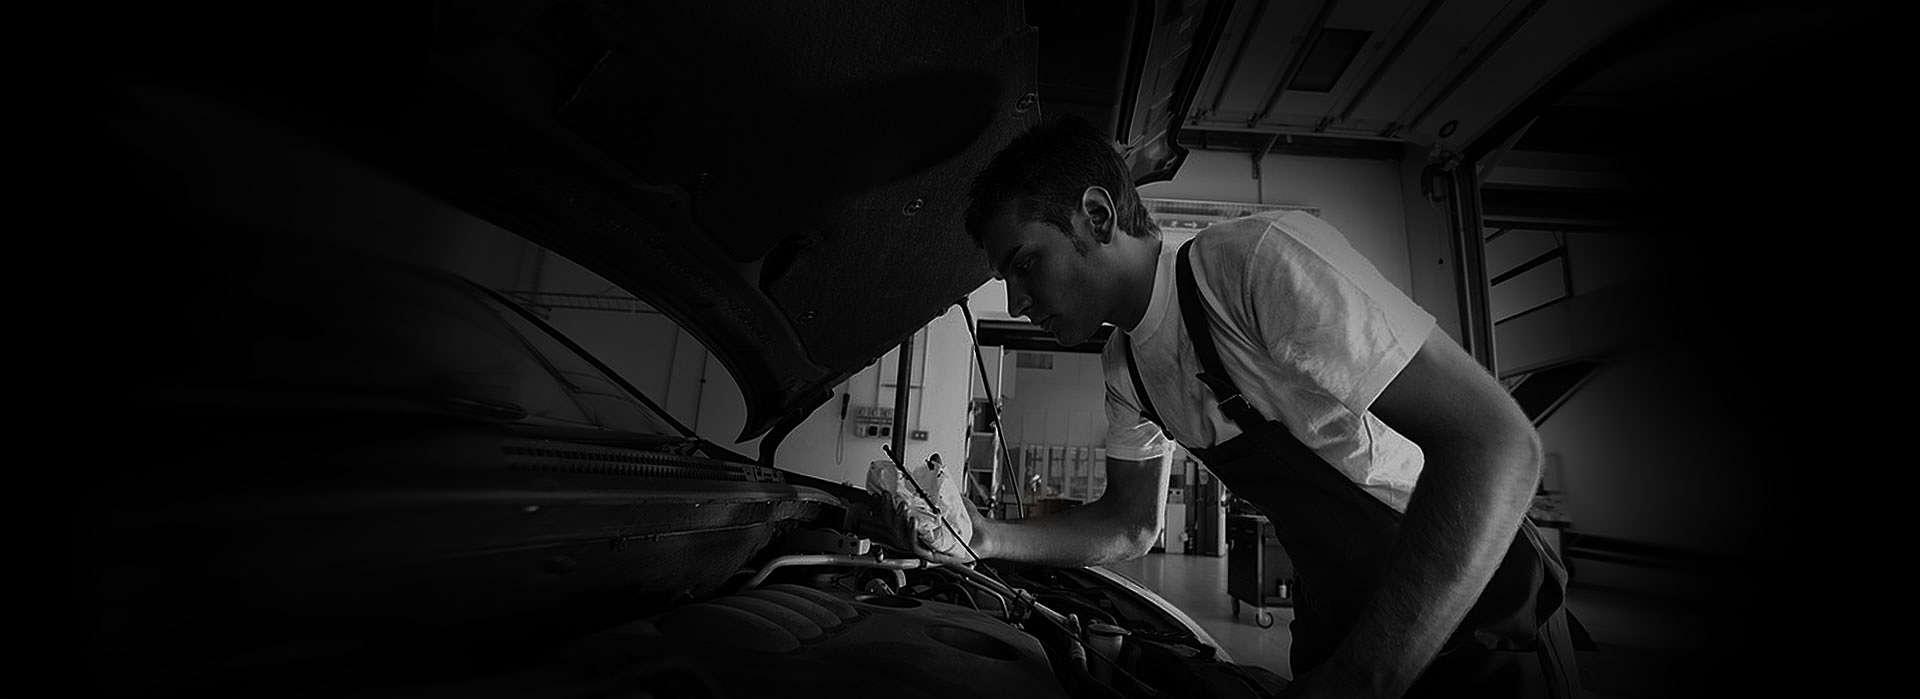 opt-mechanic-bg